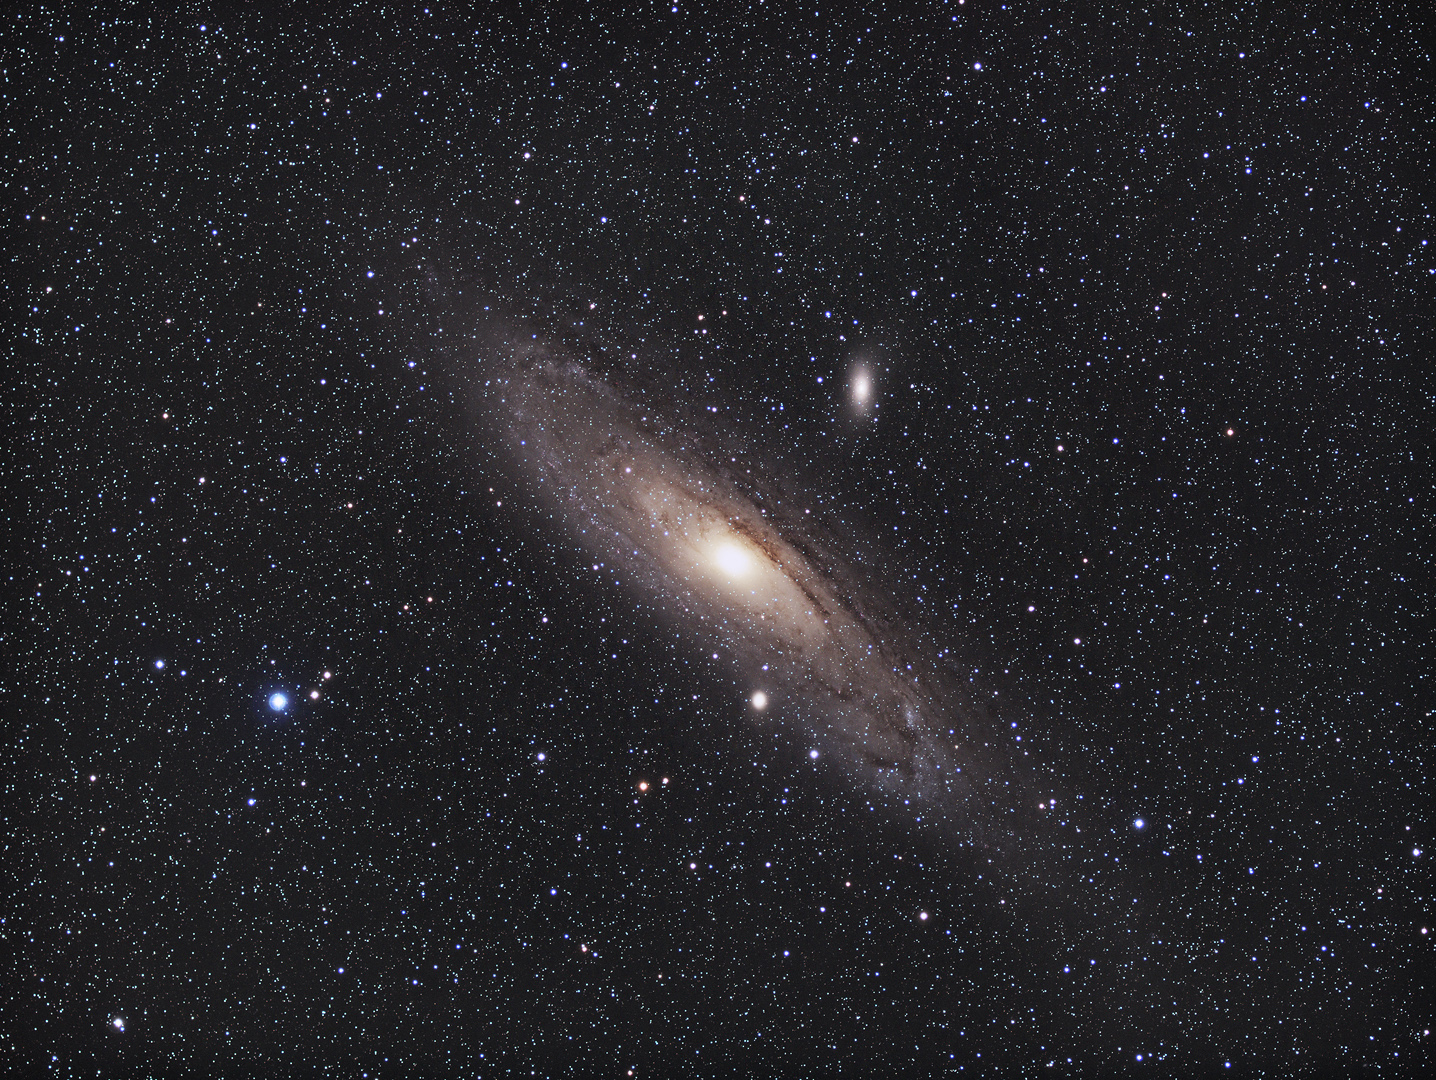 M31,M32,M110 / 3.9.2019 / Vixen FL55SS, 240mm / ASI1600MMC, 180min / F. Steimer